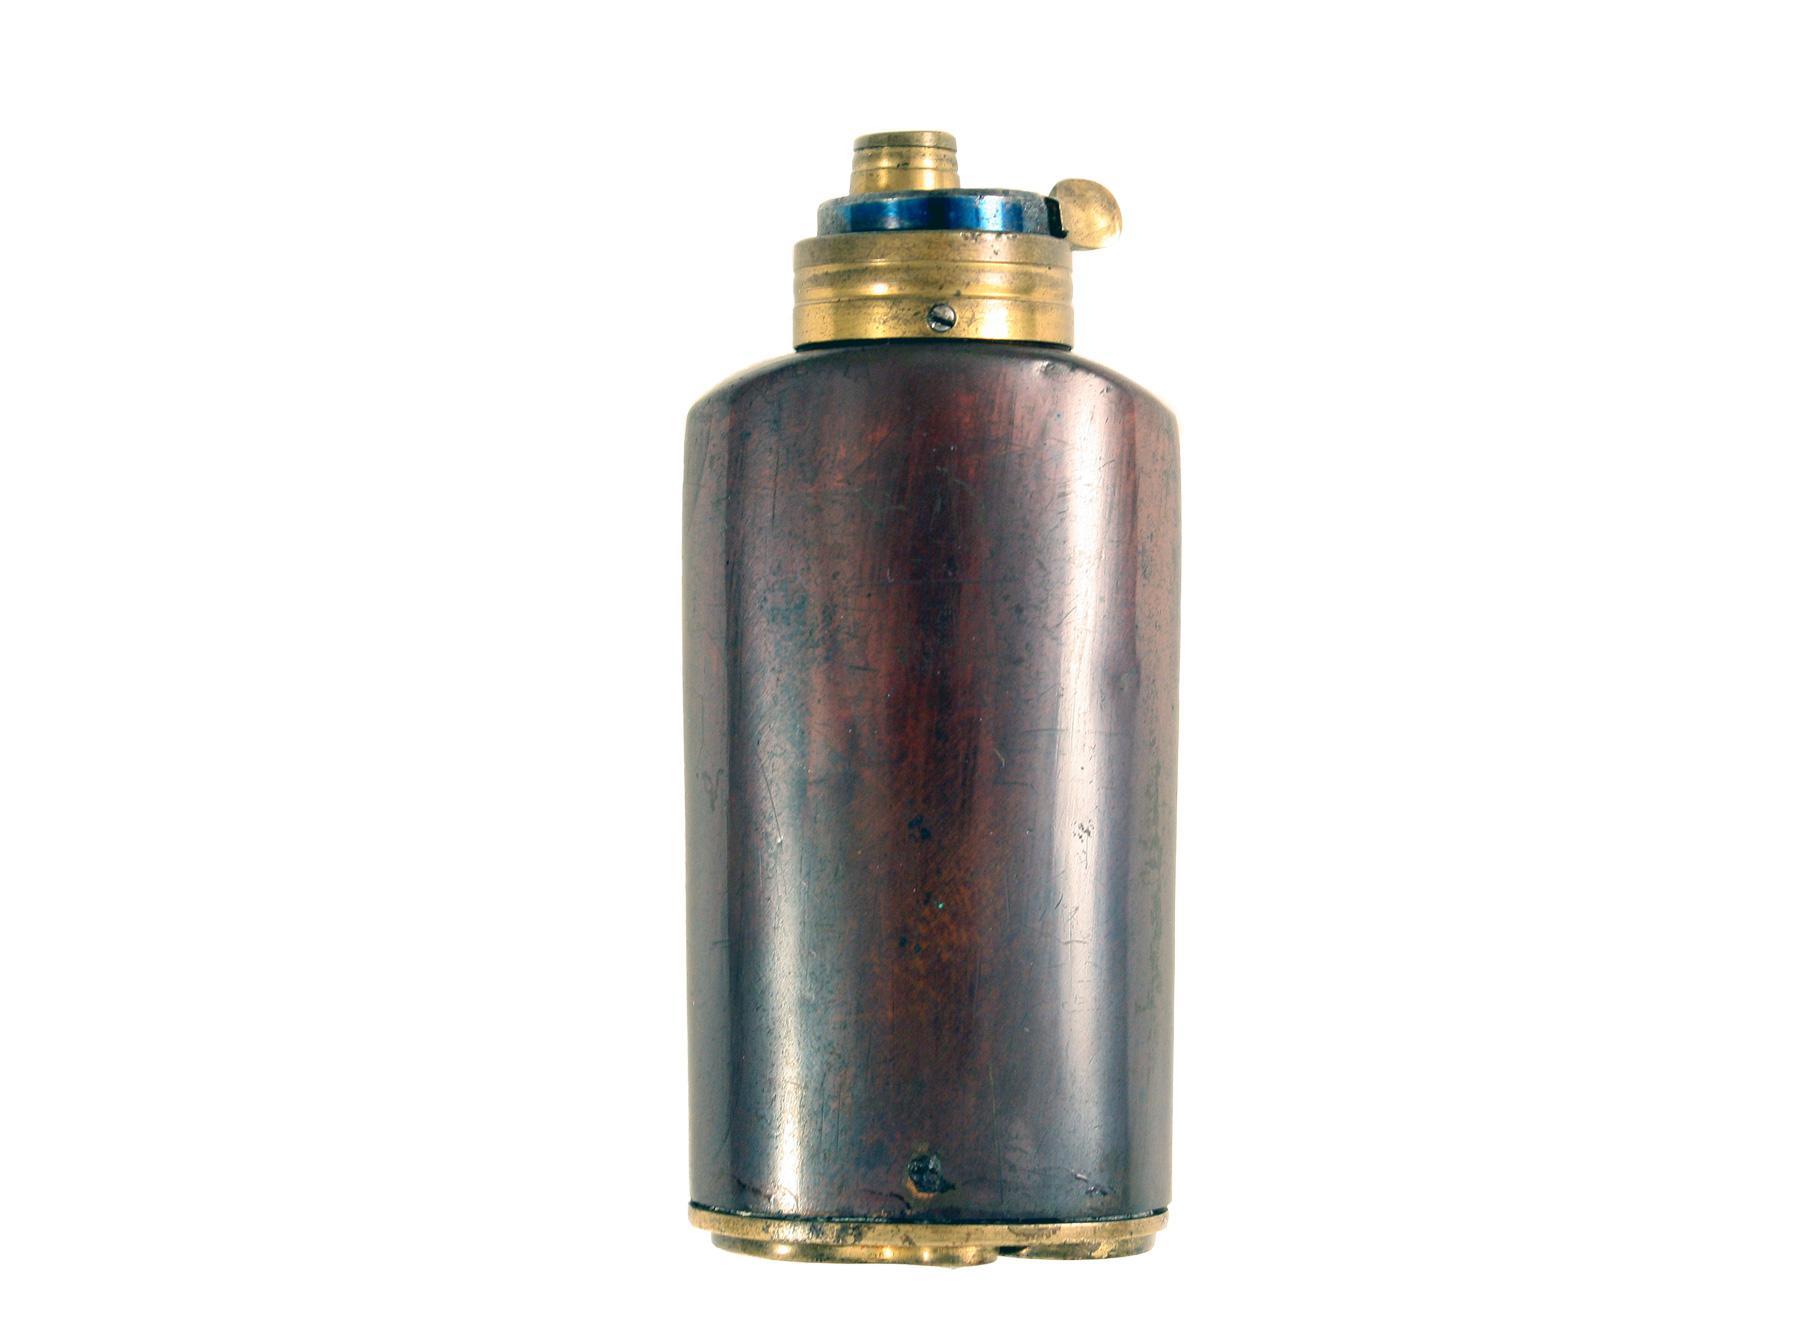 A Scarce Pistol Flask